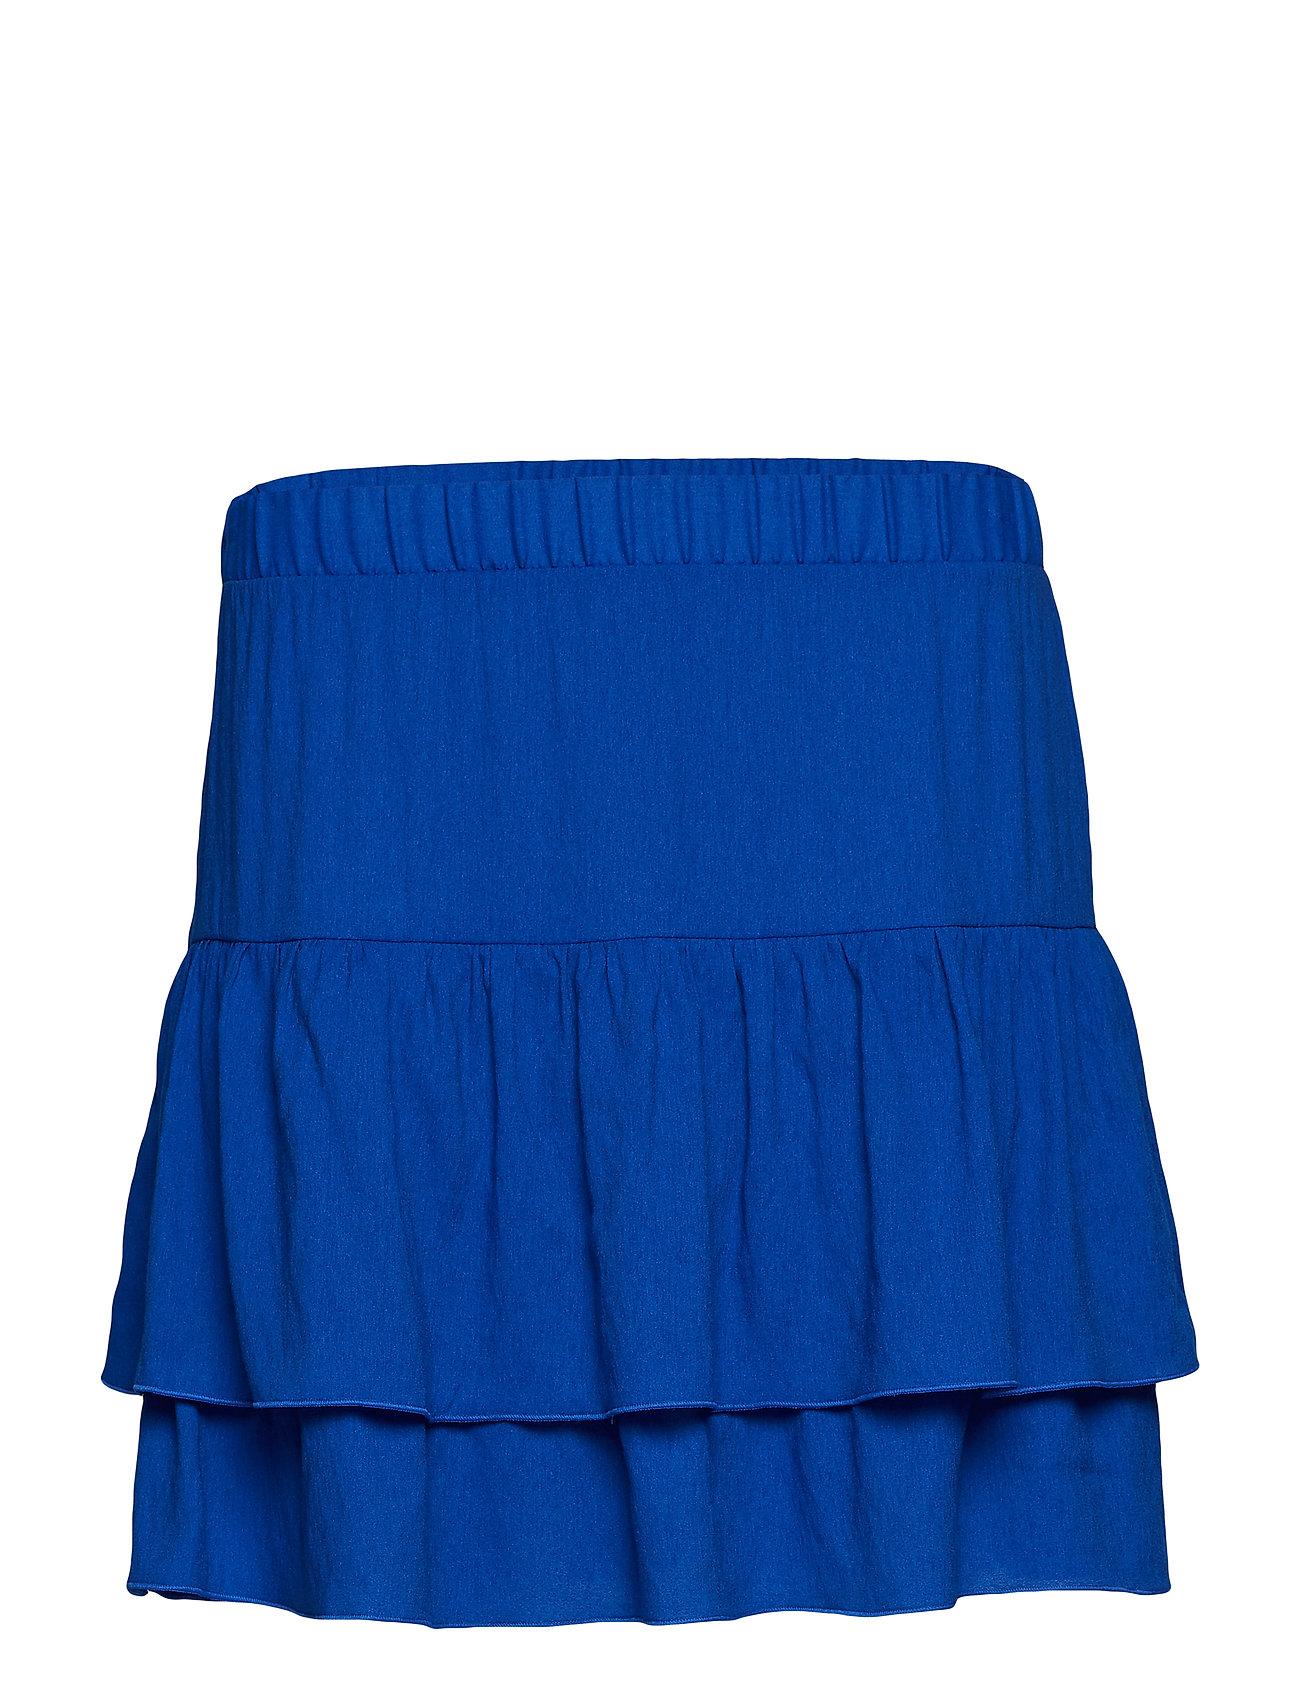 Stig P Nora - 54-BLUE